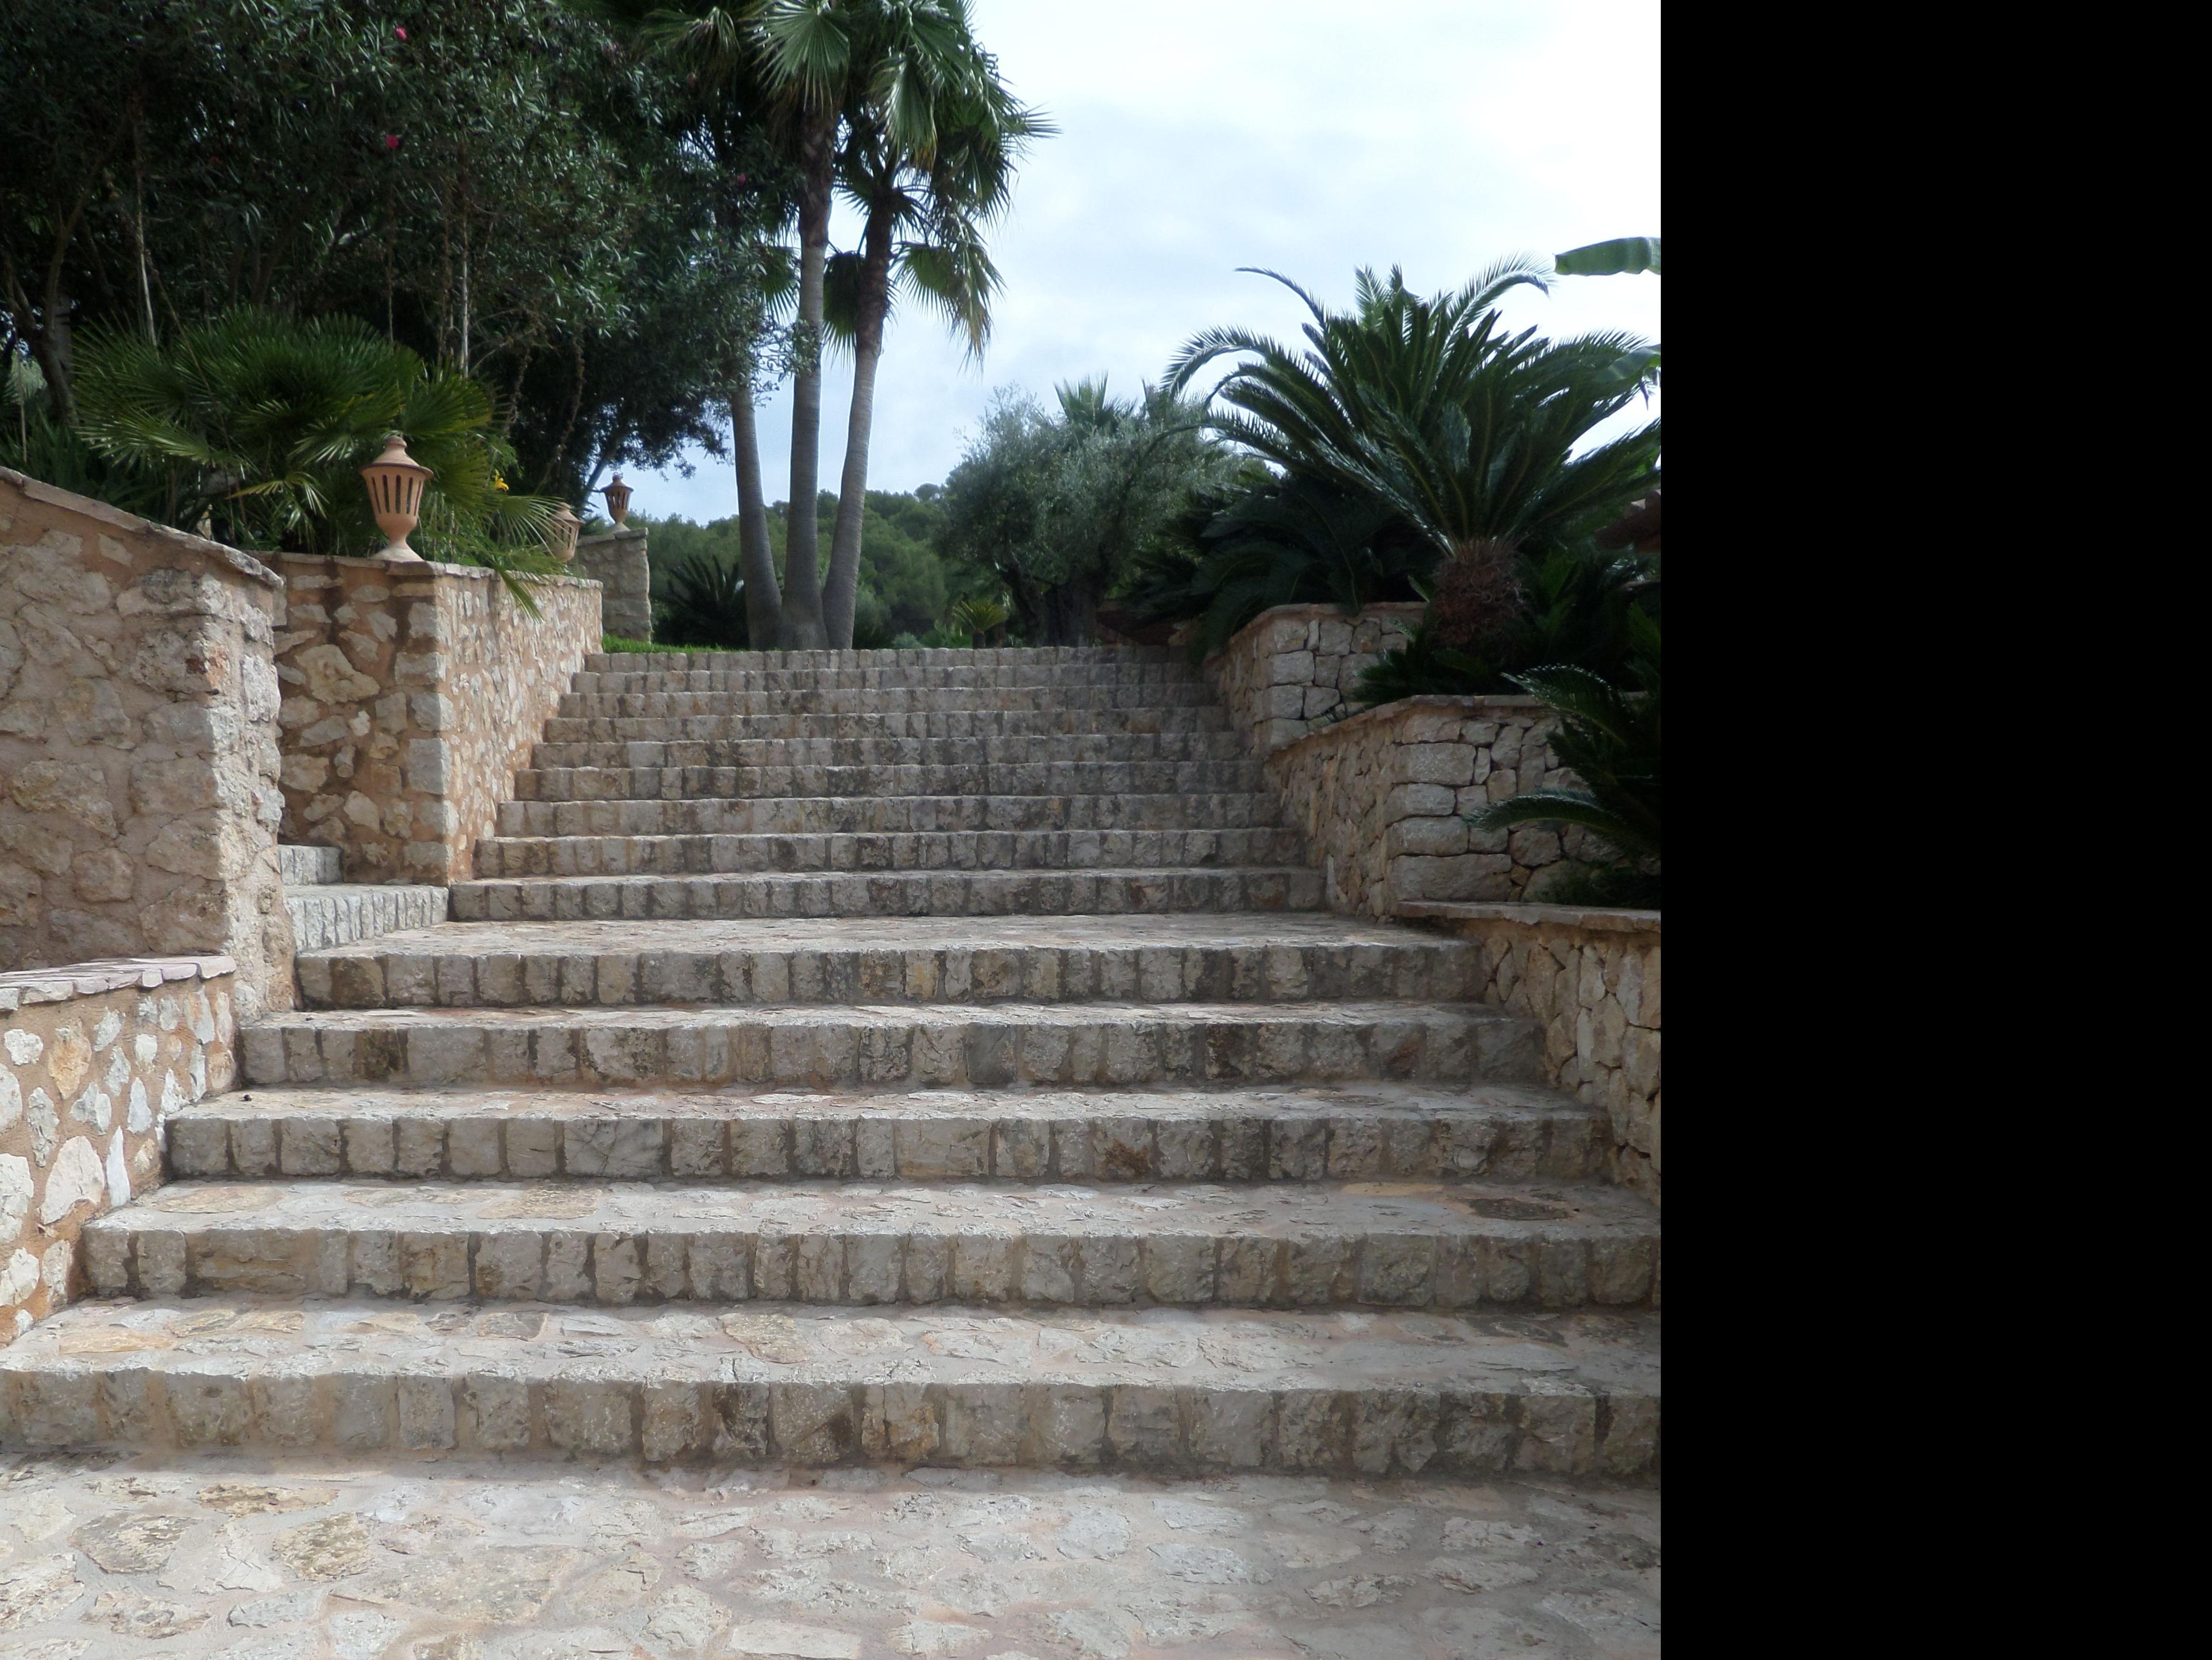 Escalera de Piedra natural